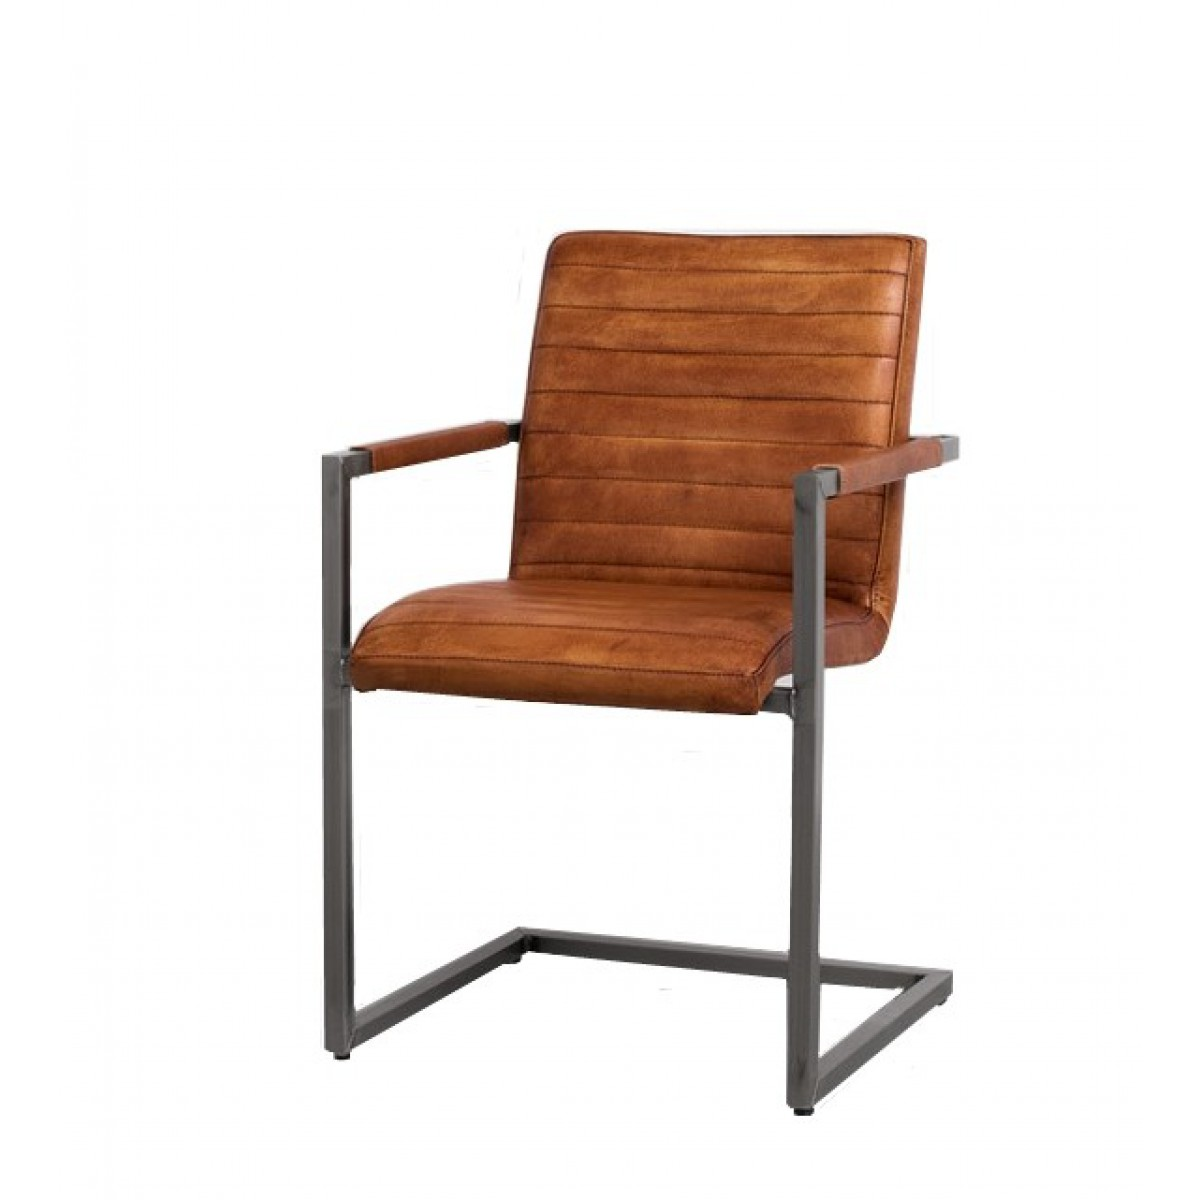 sabine-armstoel-stuhl-mit-lehnen-buffel-leer-cognac-metaal-frame